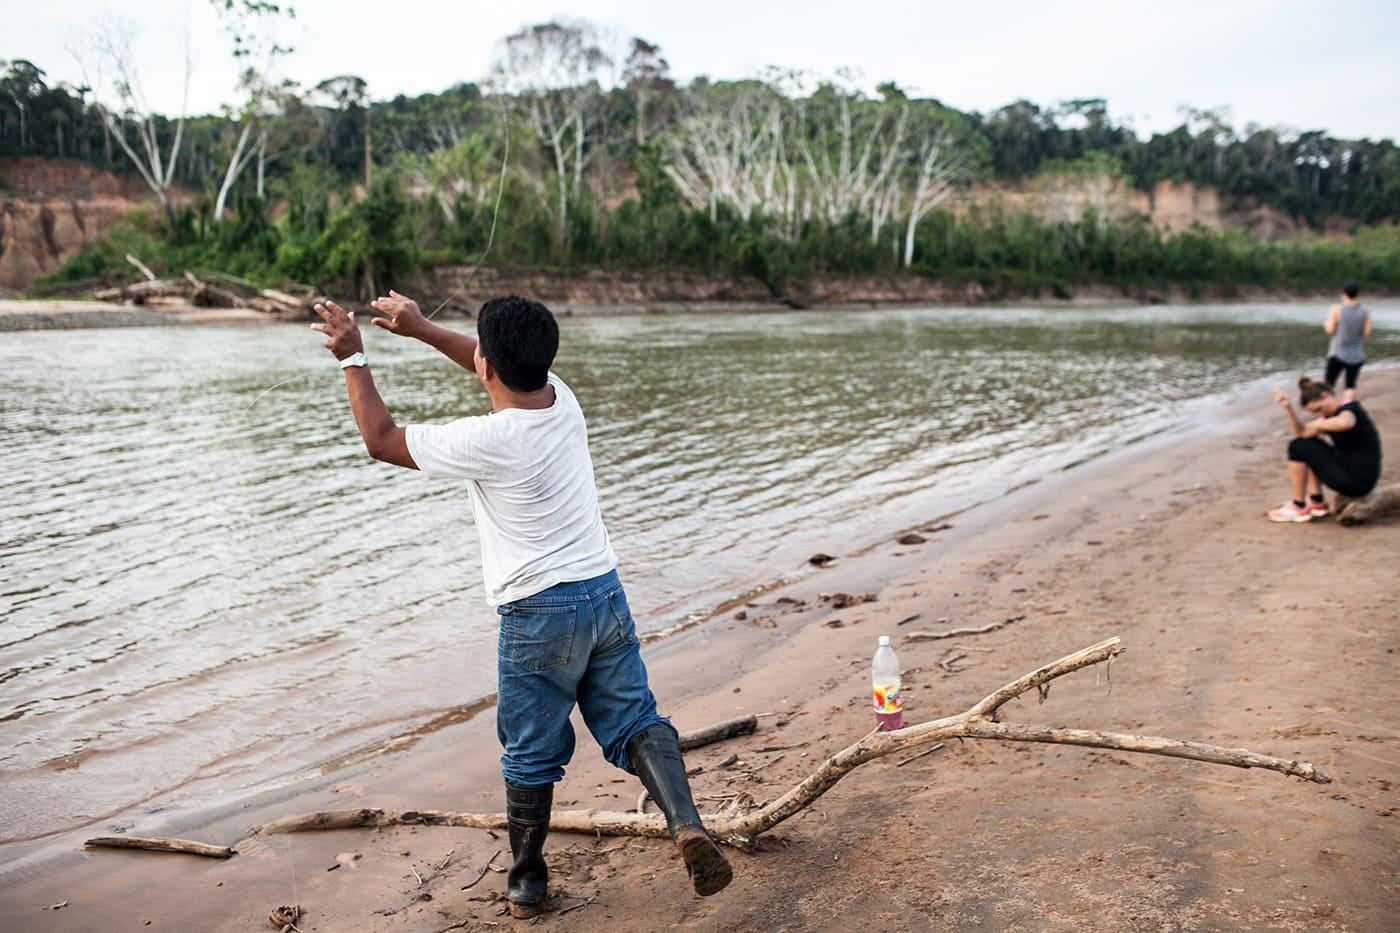 Jungle tour of the Bolivian Amazon with Mashiquipe Travel